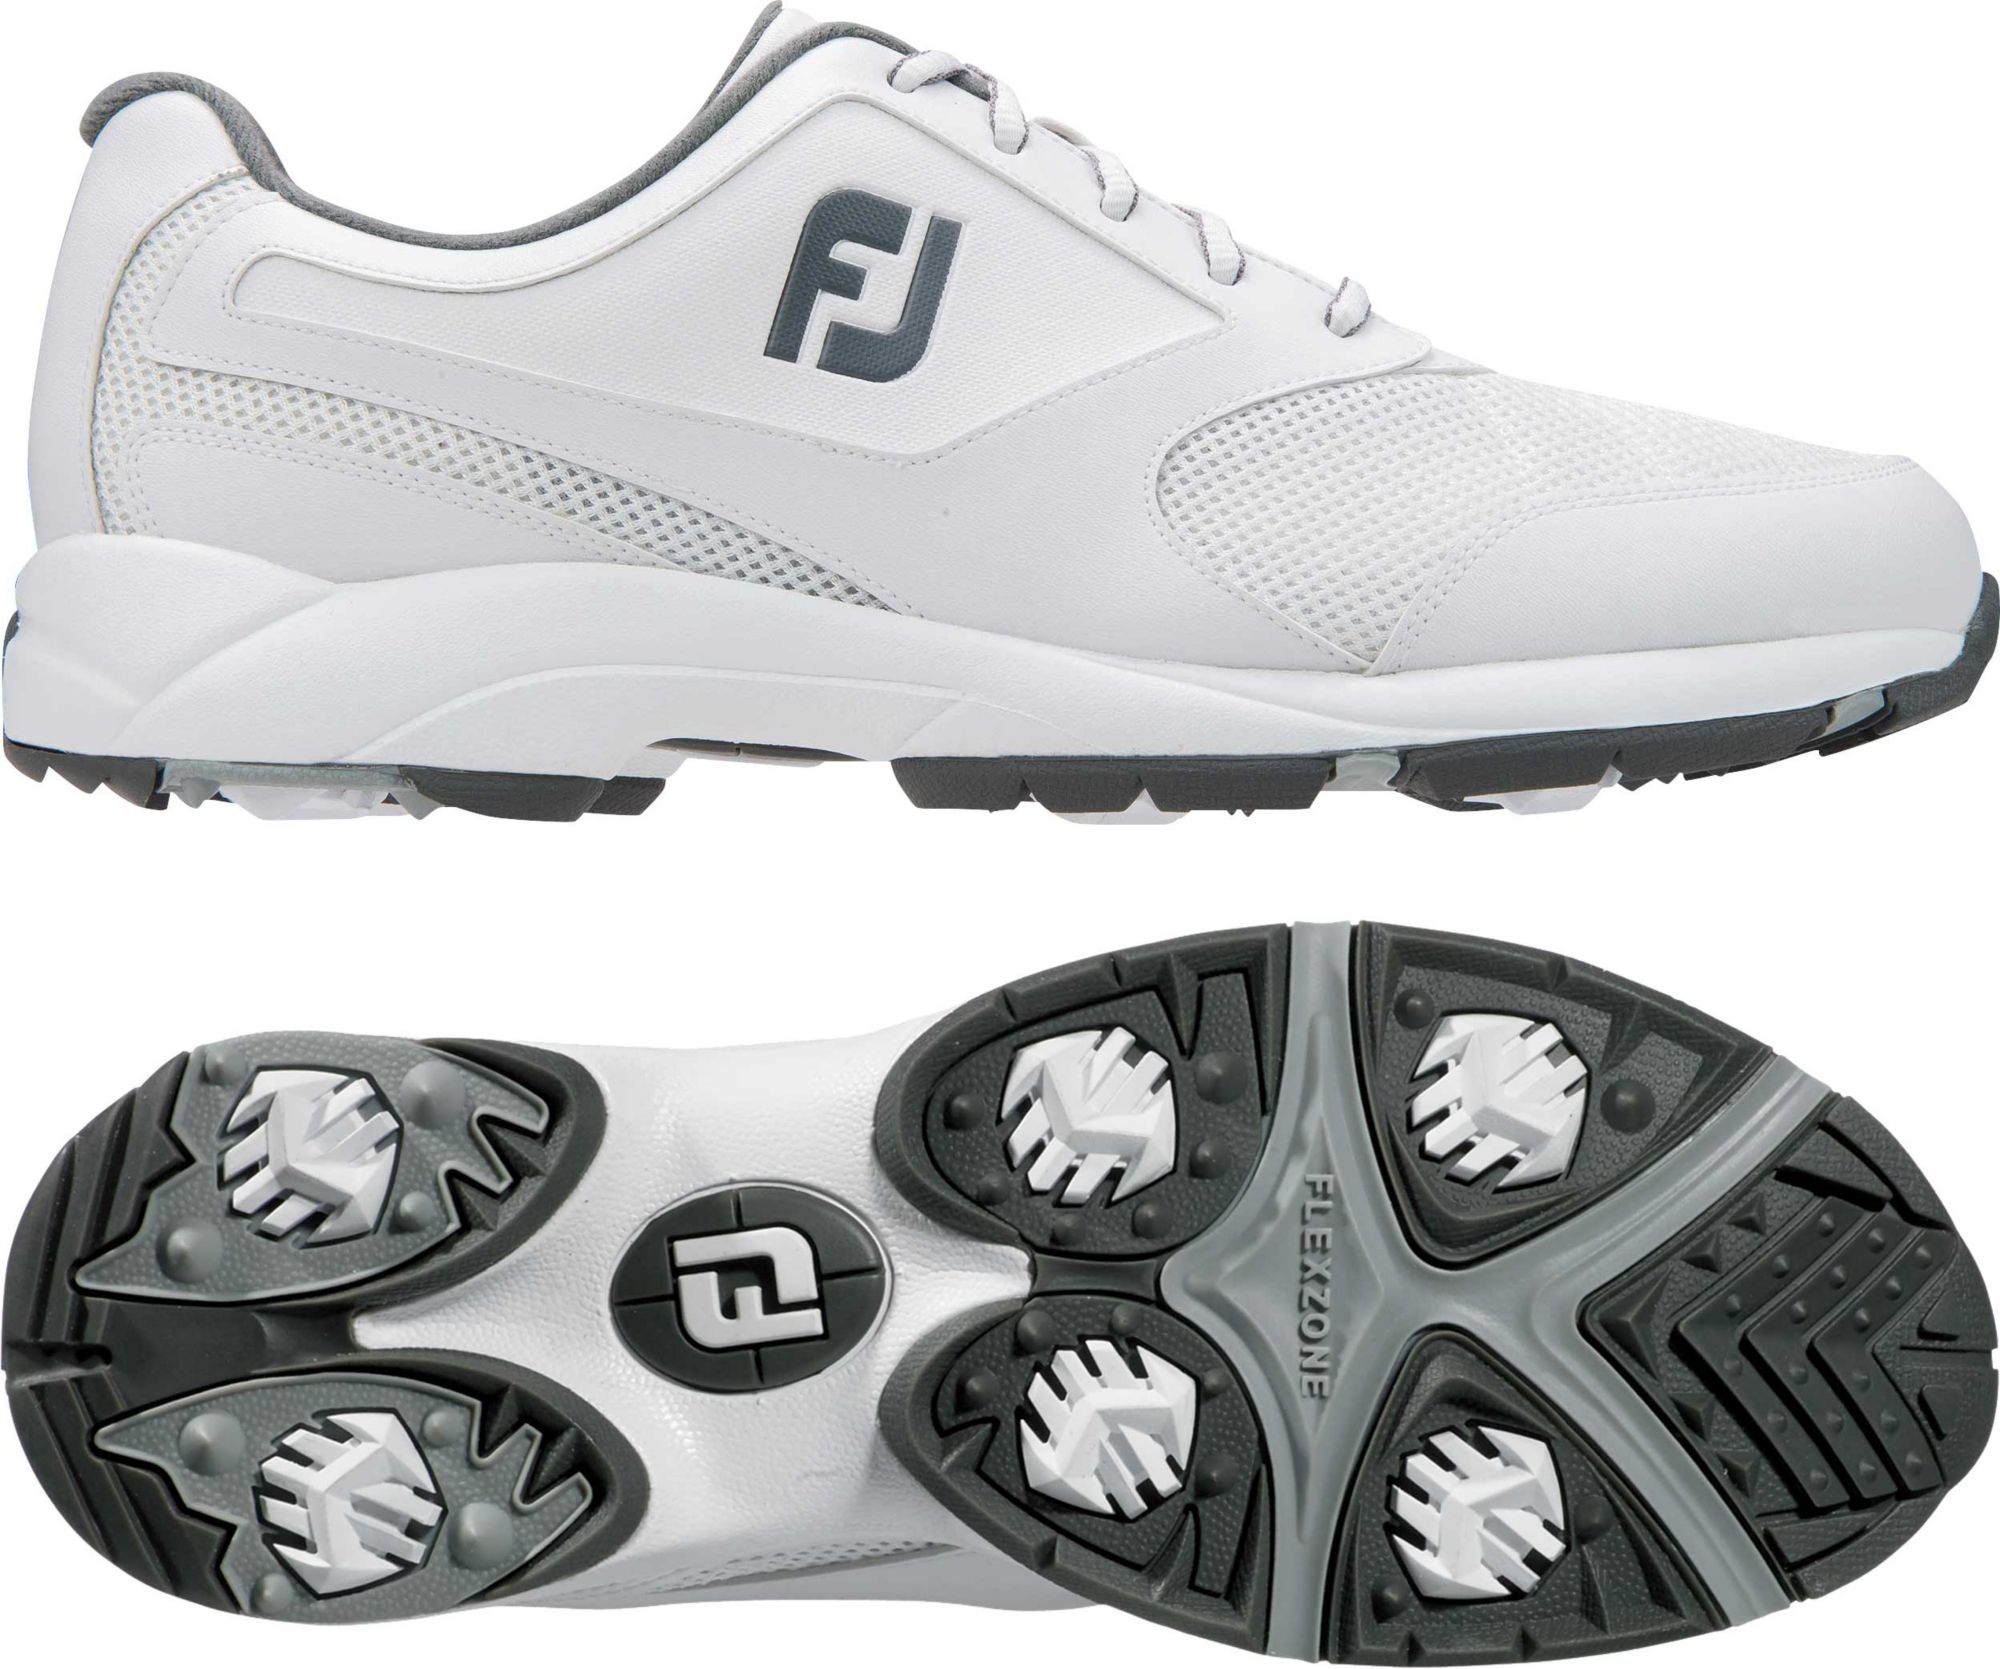 c580a9365eb821 FootJoy Men s Athletics Golf Shoes (Previous Season Style)